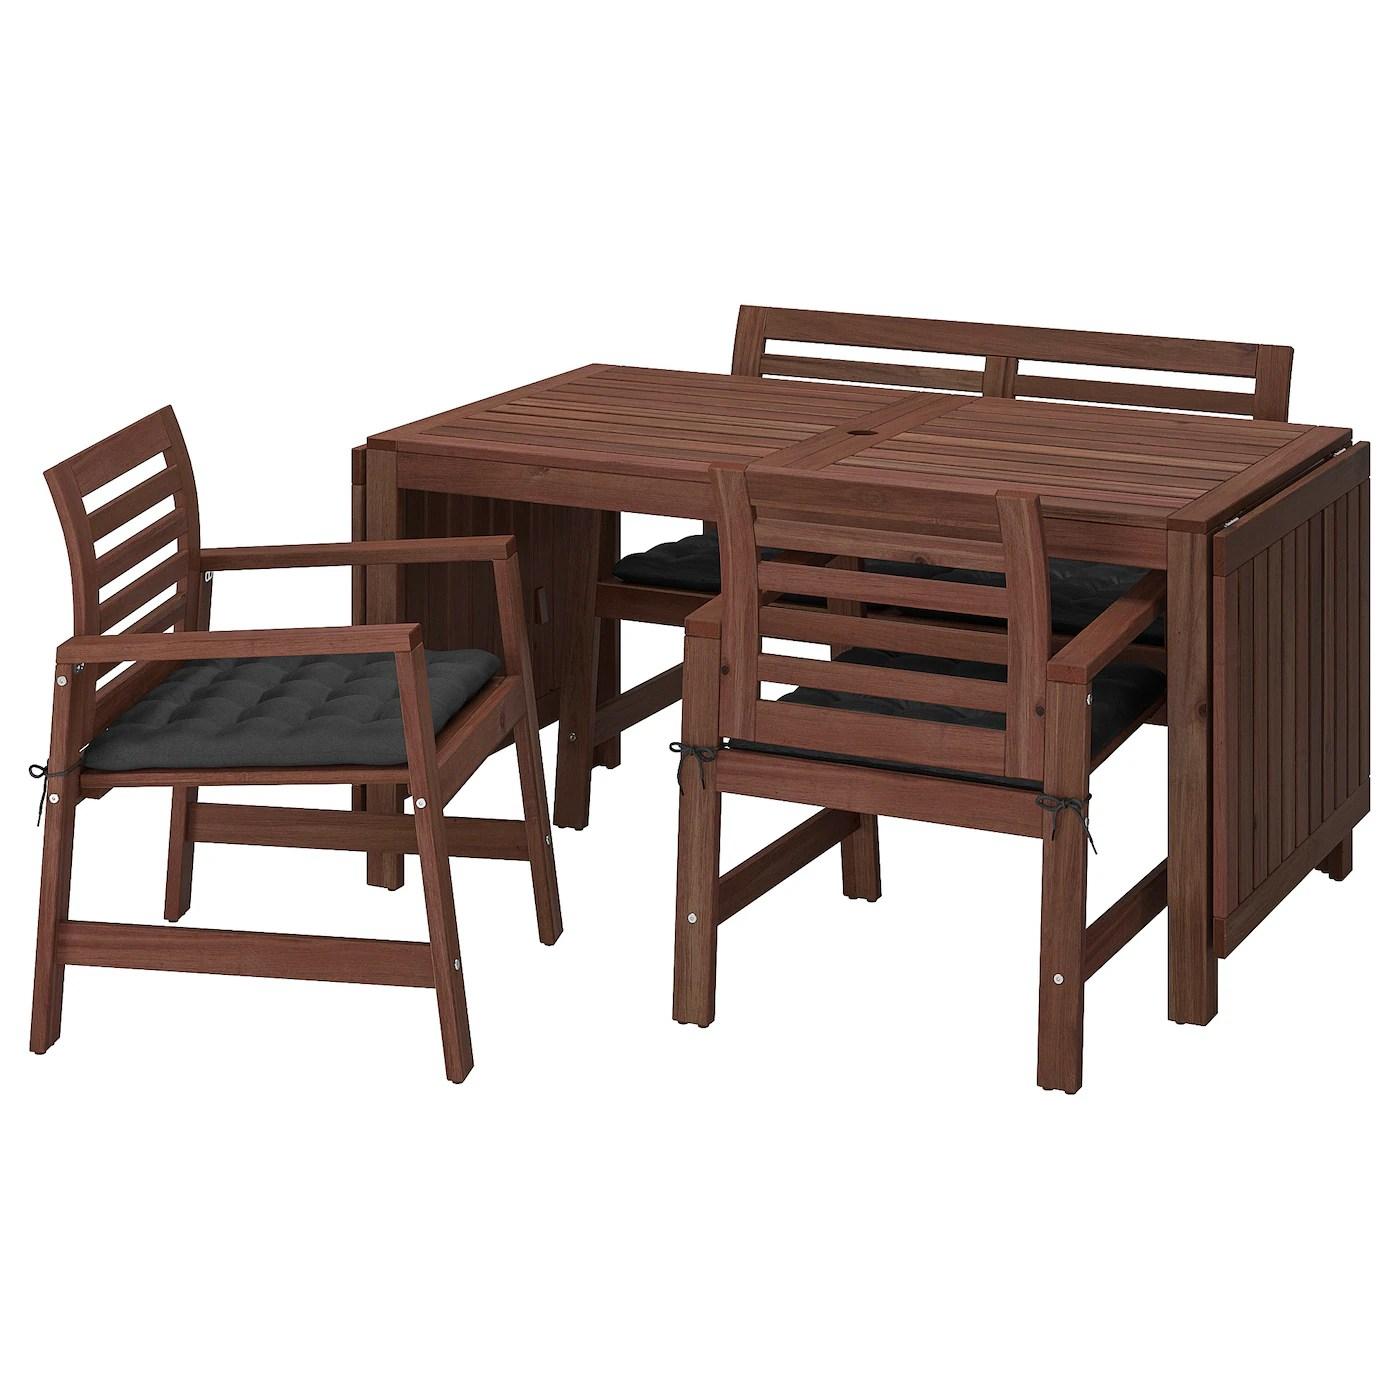 Applaro Table 2 Chrsw Armr Bench Outdoor Black Ikea